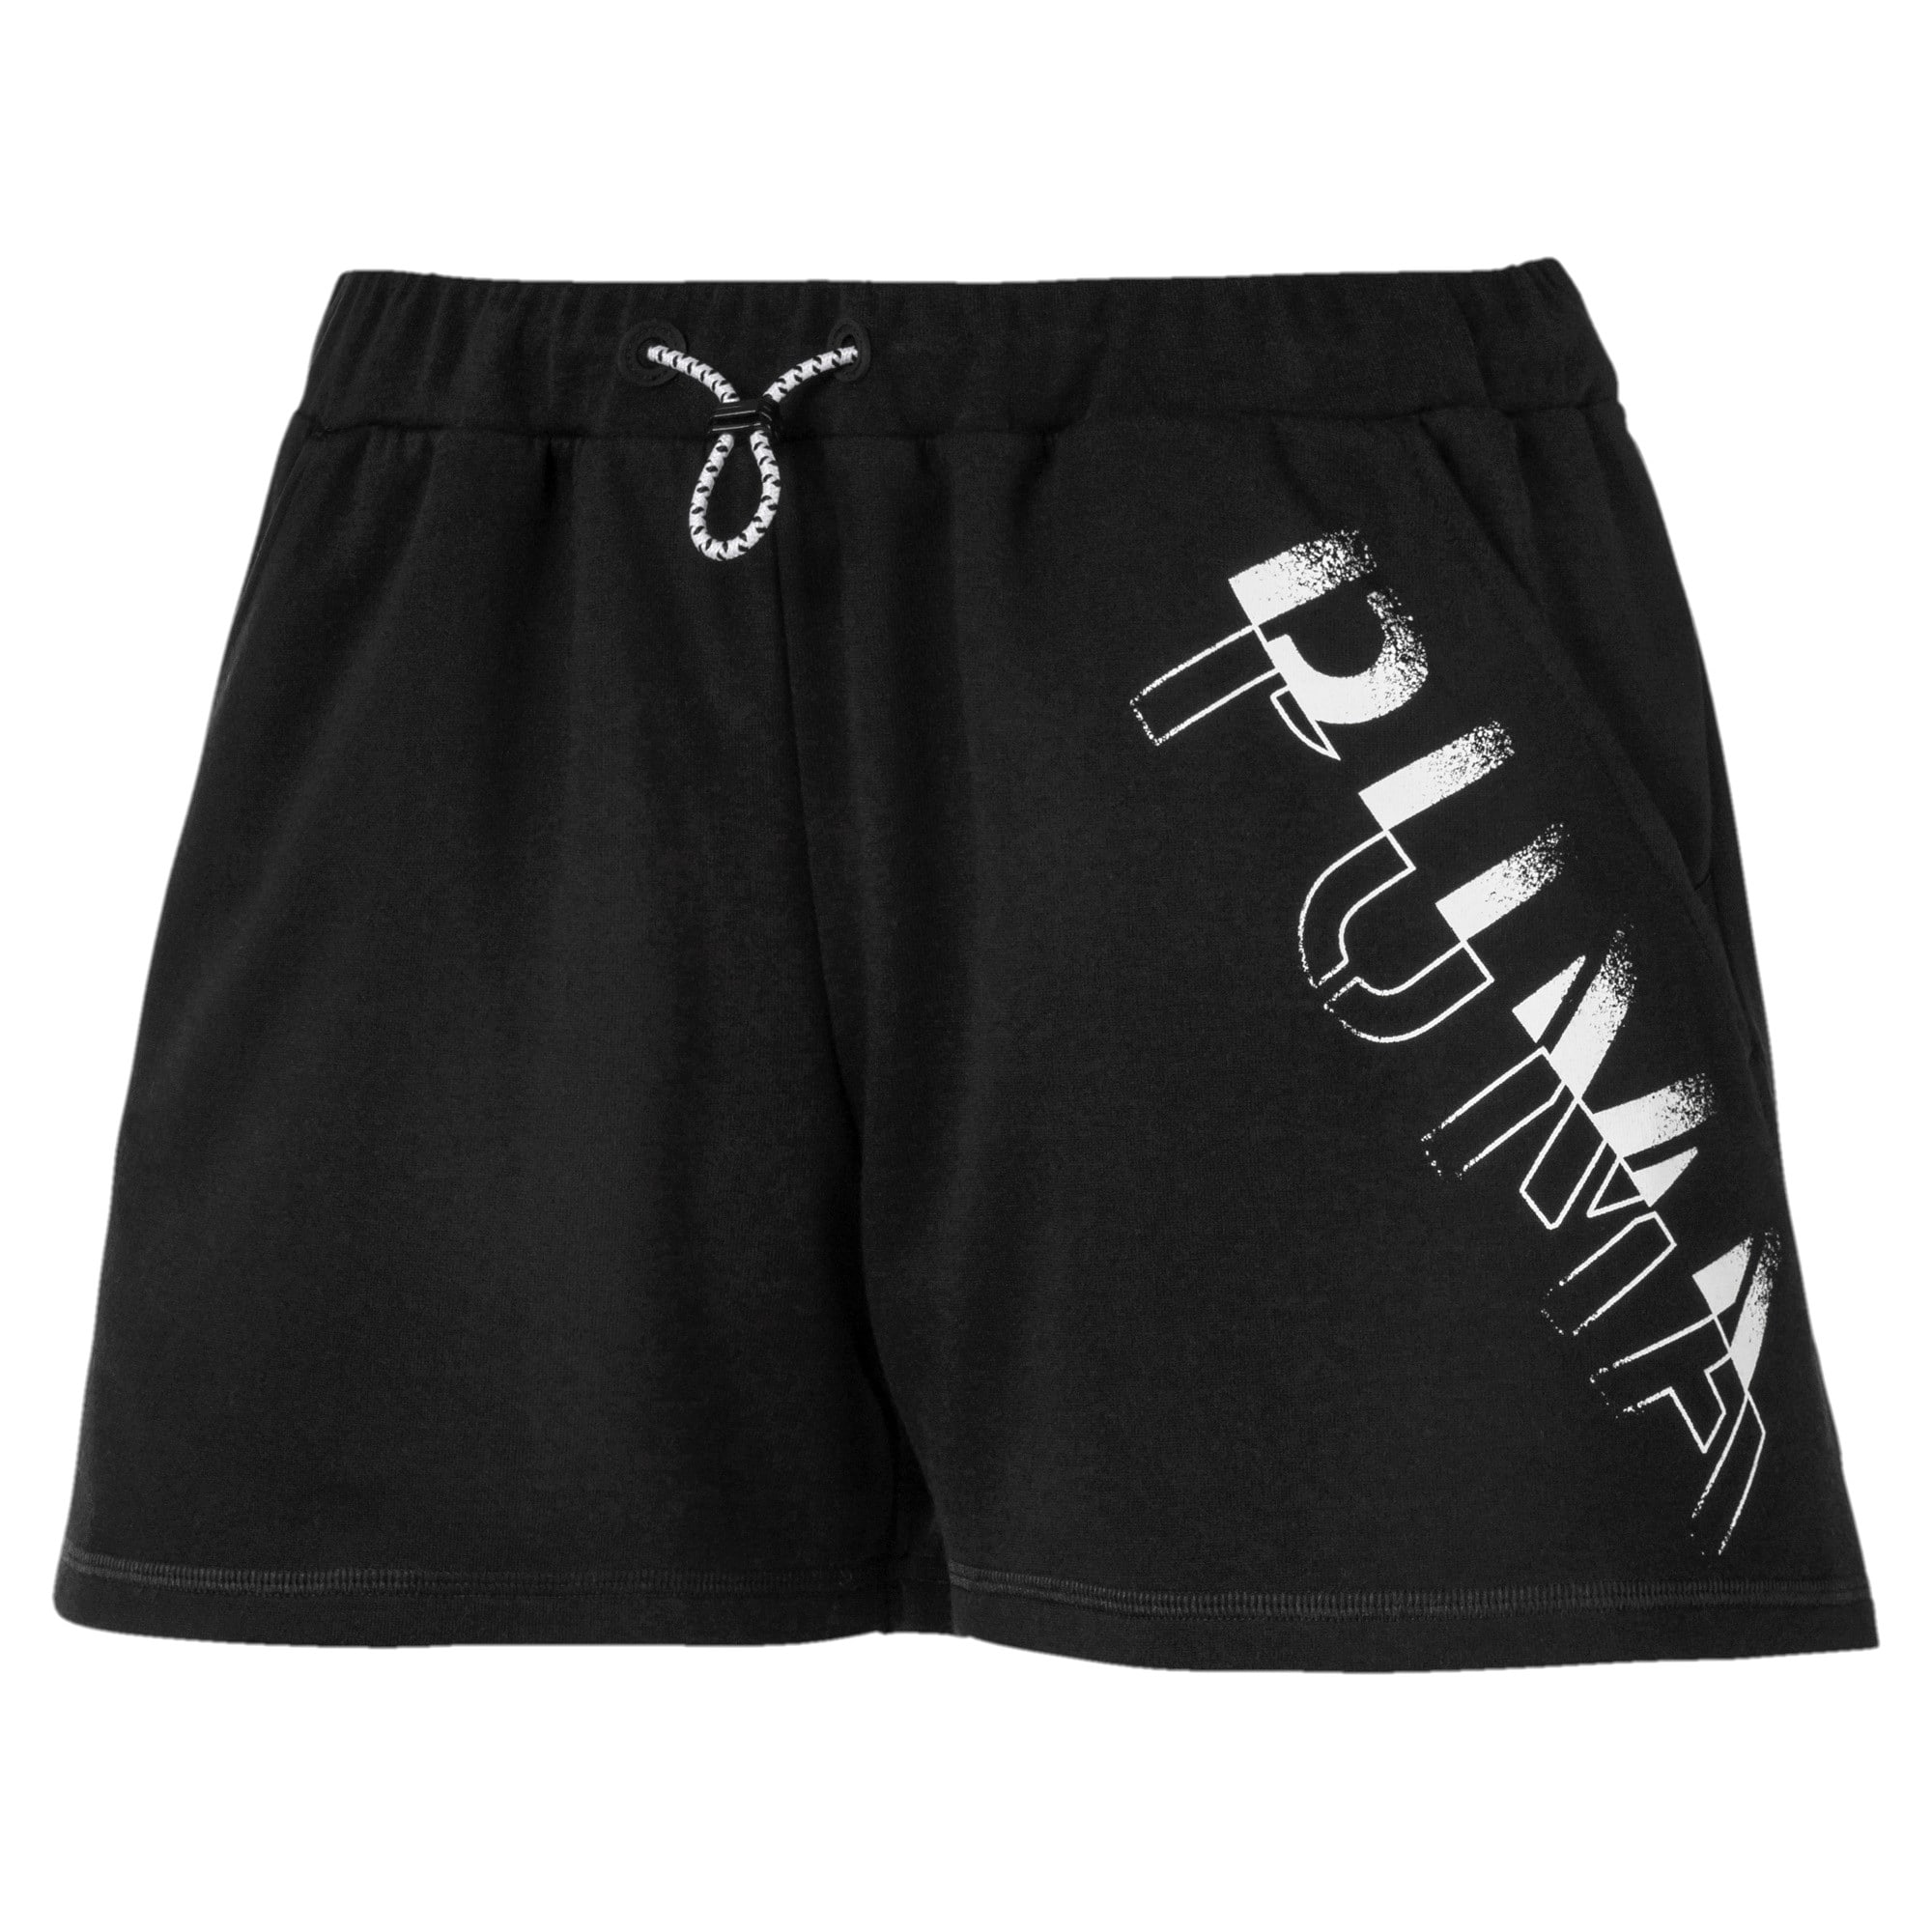 Miniatura 1 de Shorts HIT Feel It para mujer, Puma Black, mediano